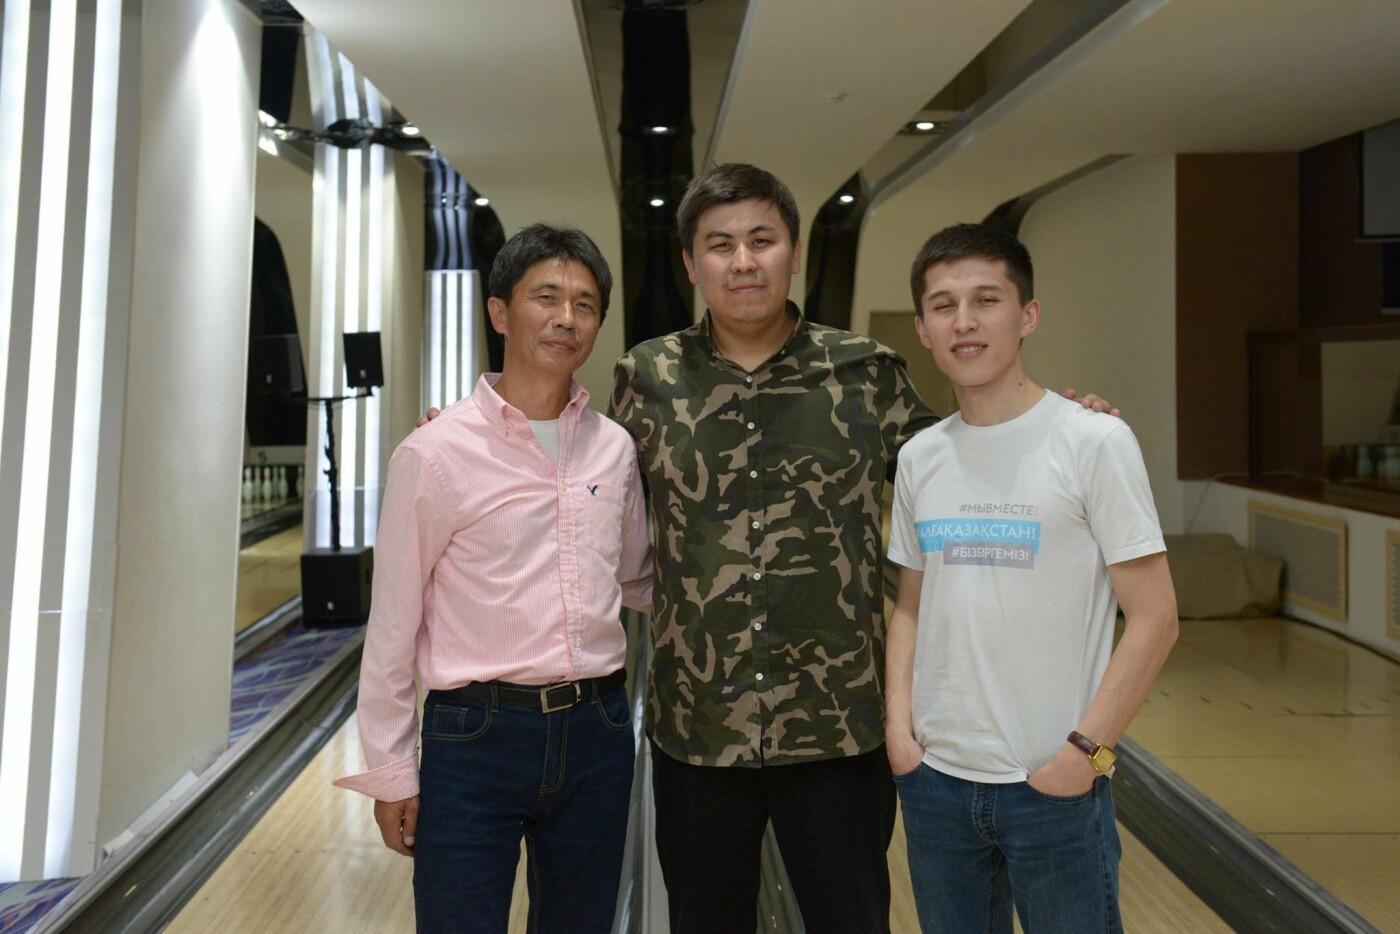 II турнир по боулингу среди журналистов прошел в Алматы (ФОТО), фото-19